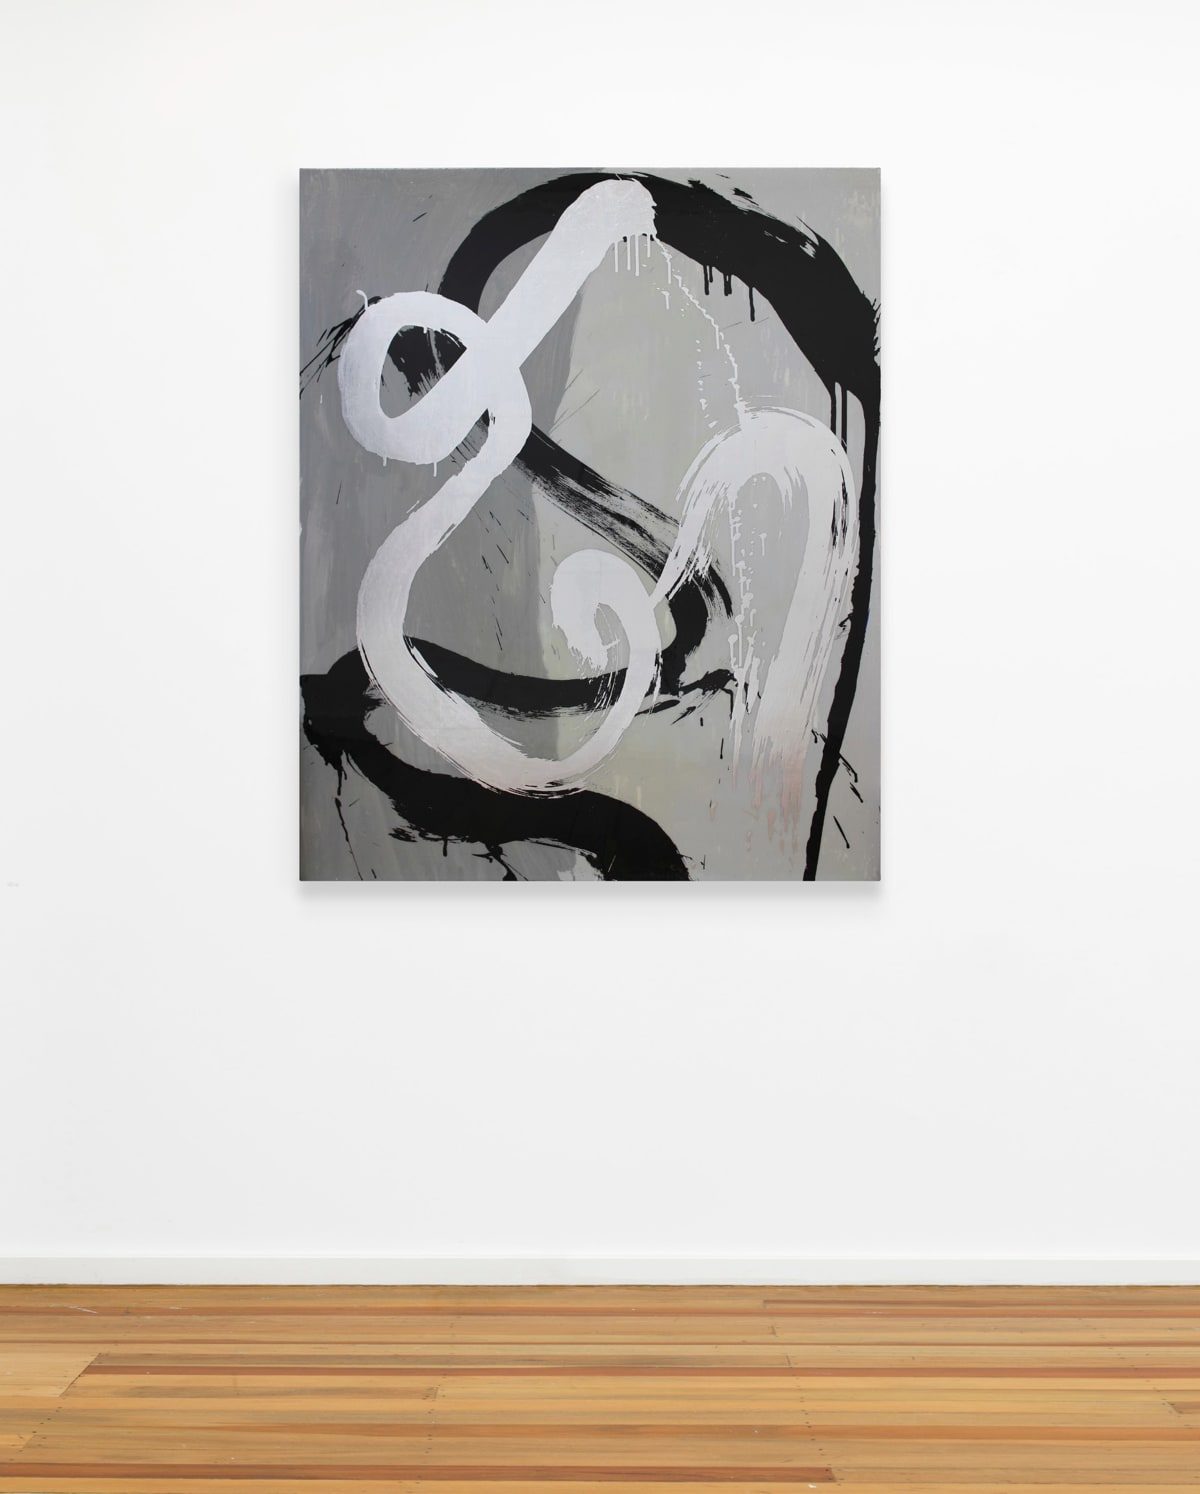 Max GIMBLETT, Homage to Arshile Gorky, 2014